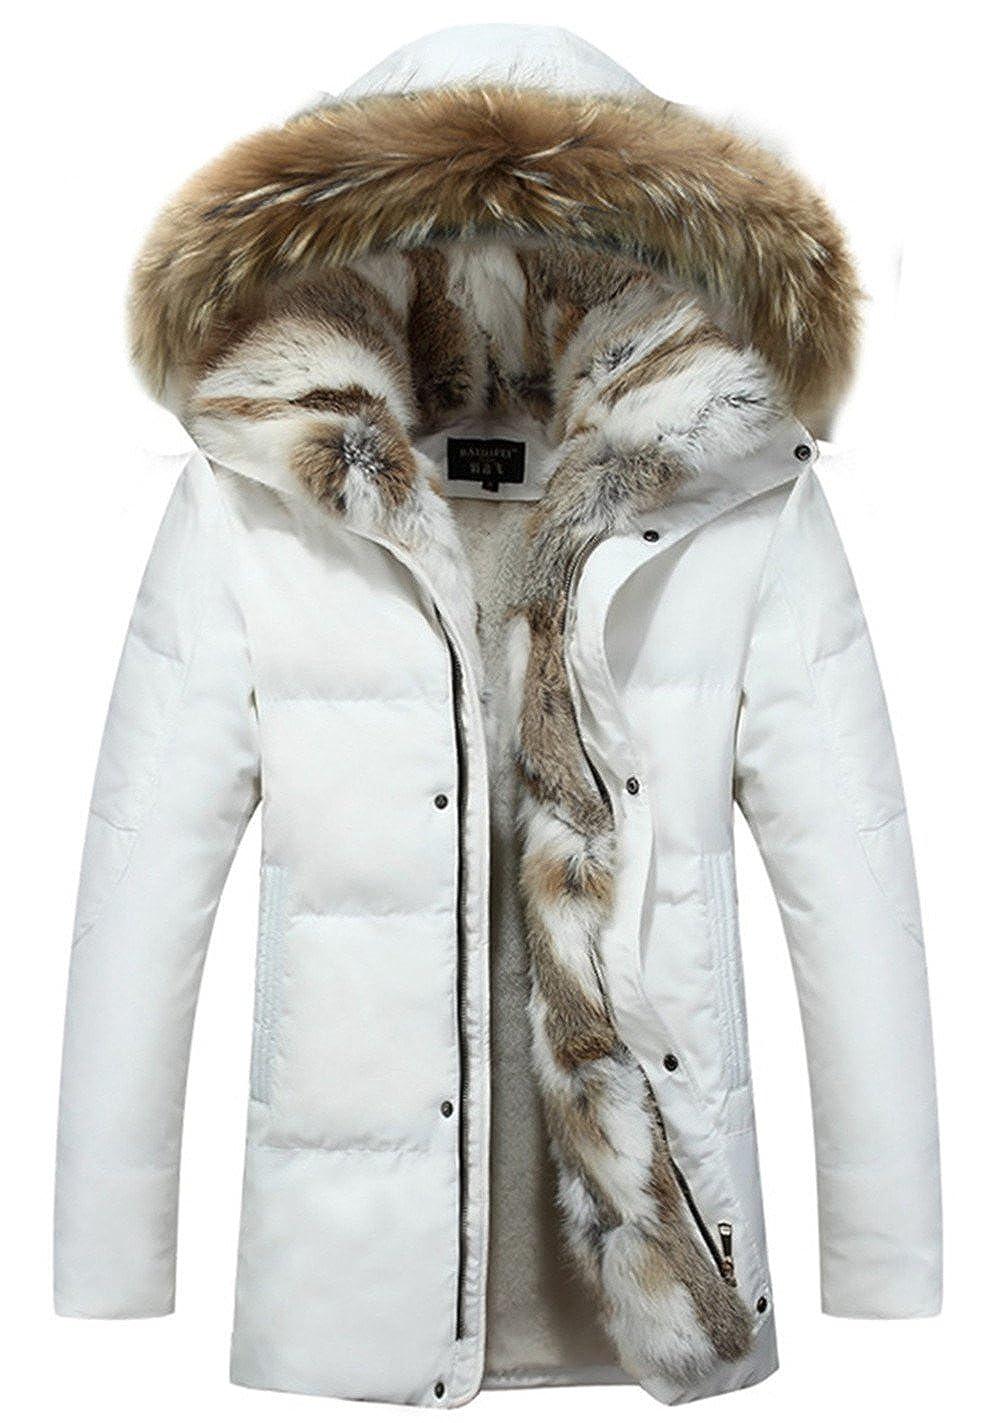 CYVVV Mens 90% Duck Down Hooded Luxurious Down Fur Coat Jacket Rex Fur Collar